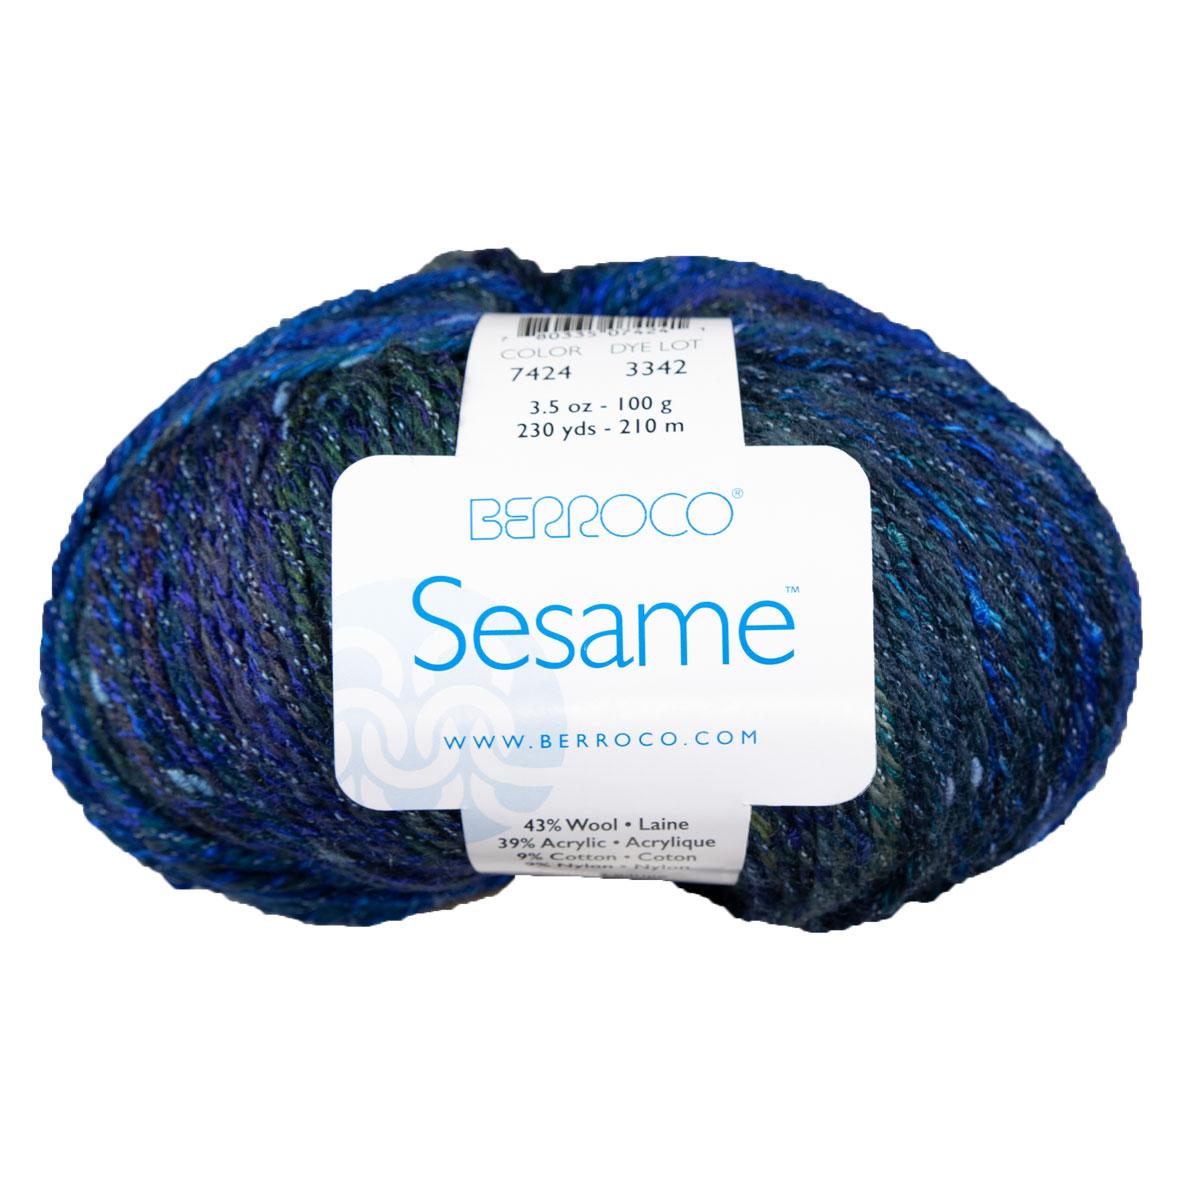 Berroco Sesame 7424 Blue Poppy